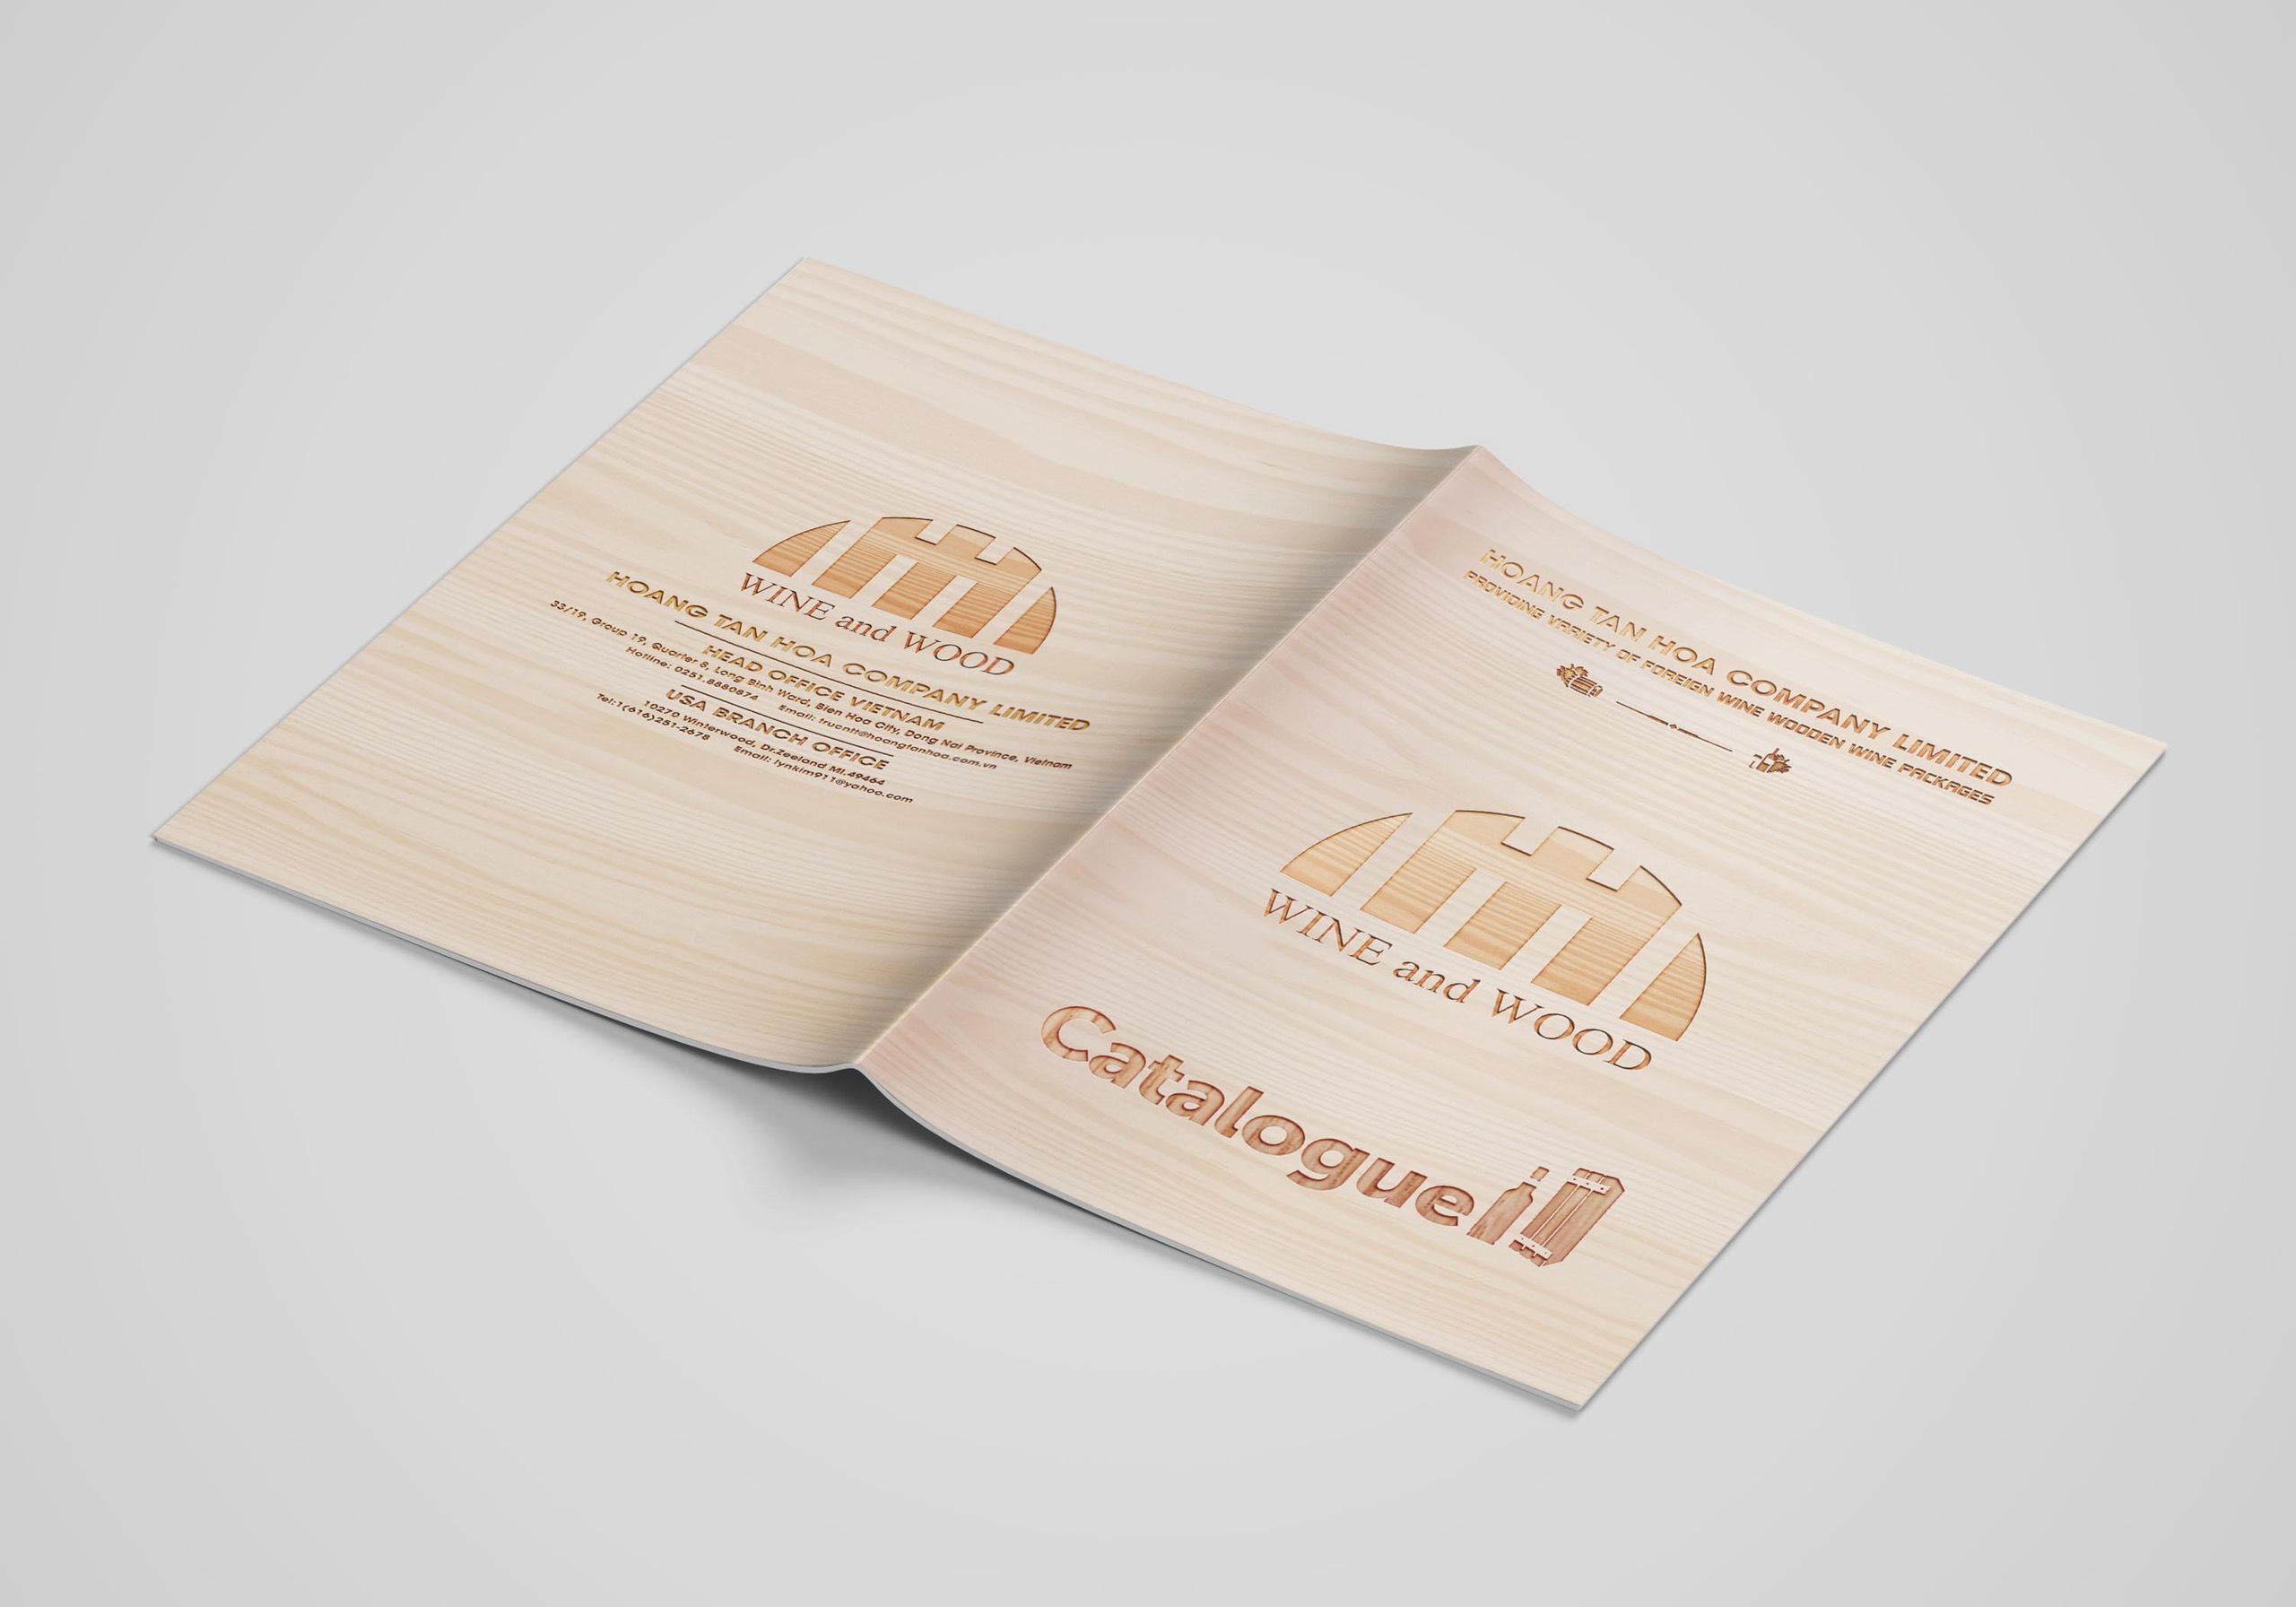 thiết kế catalogue rubic group 7